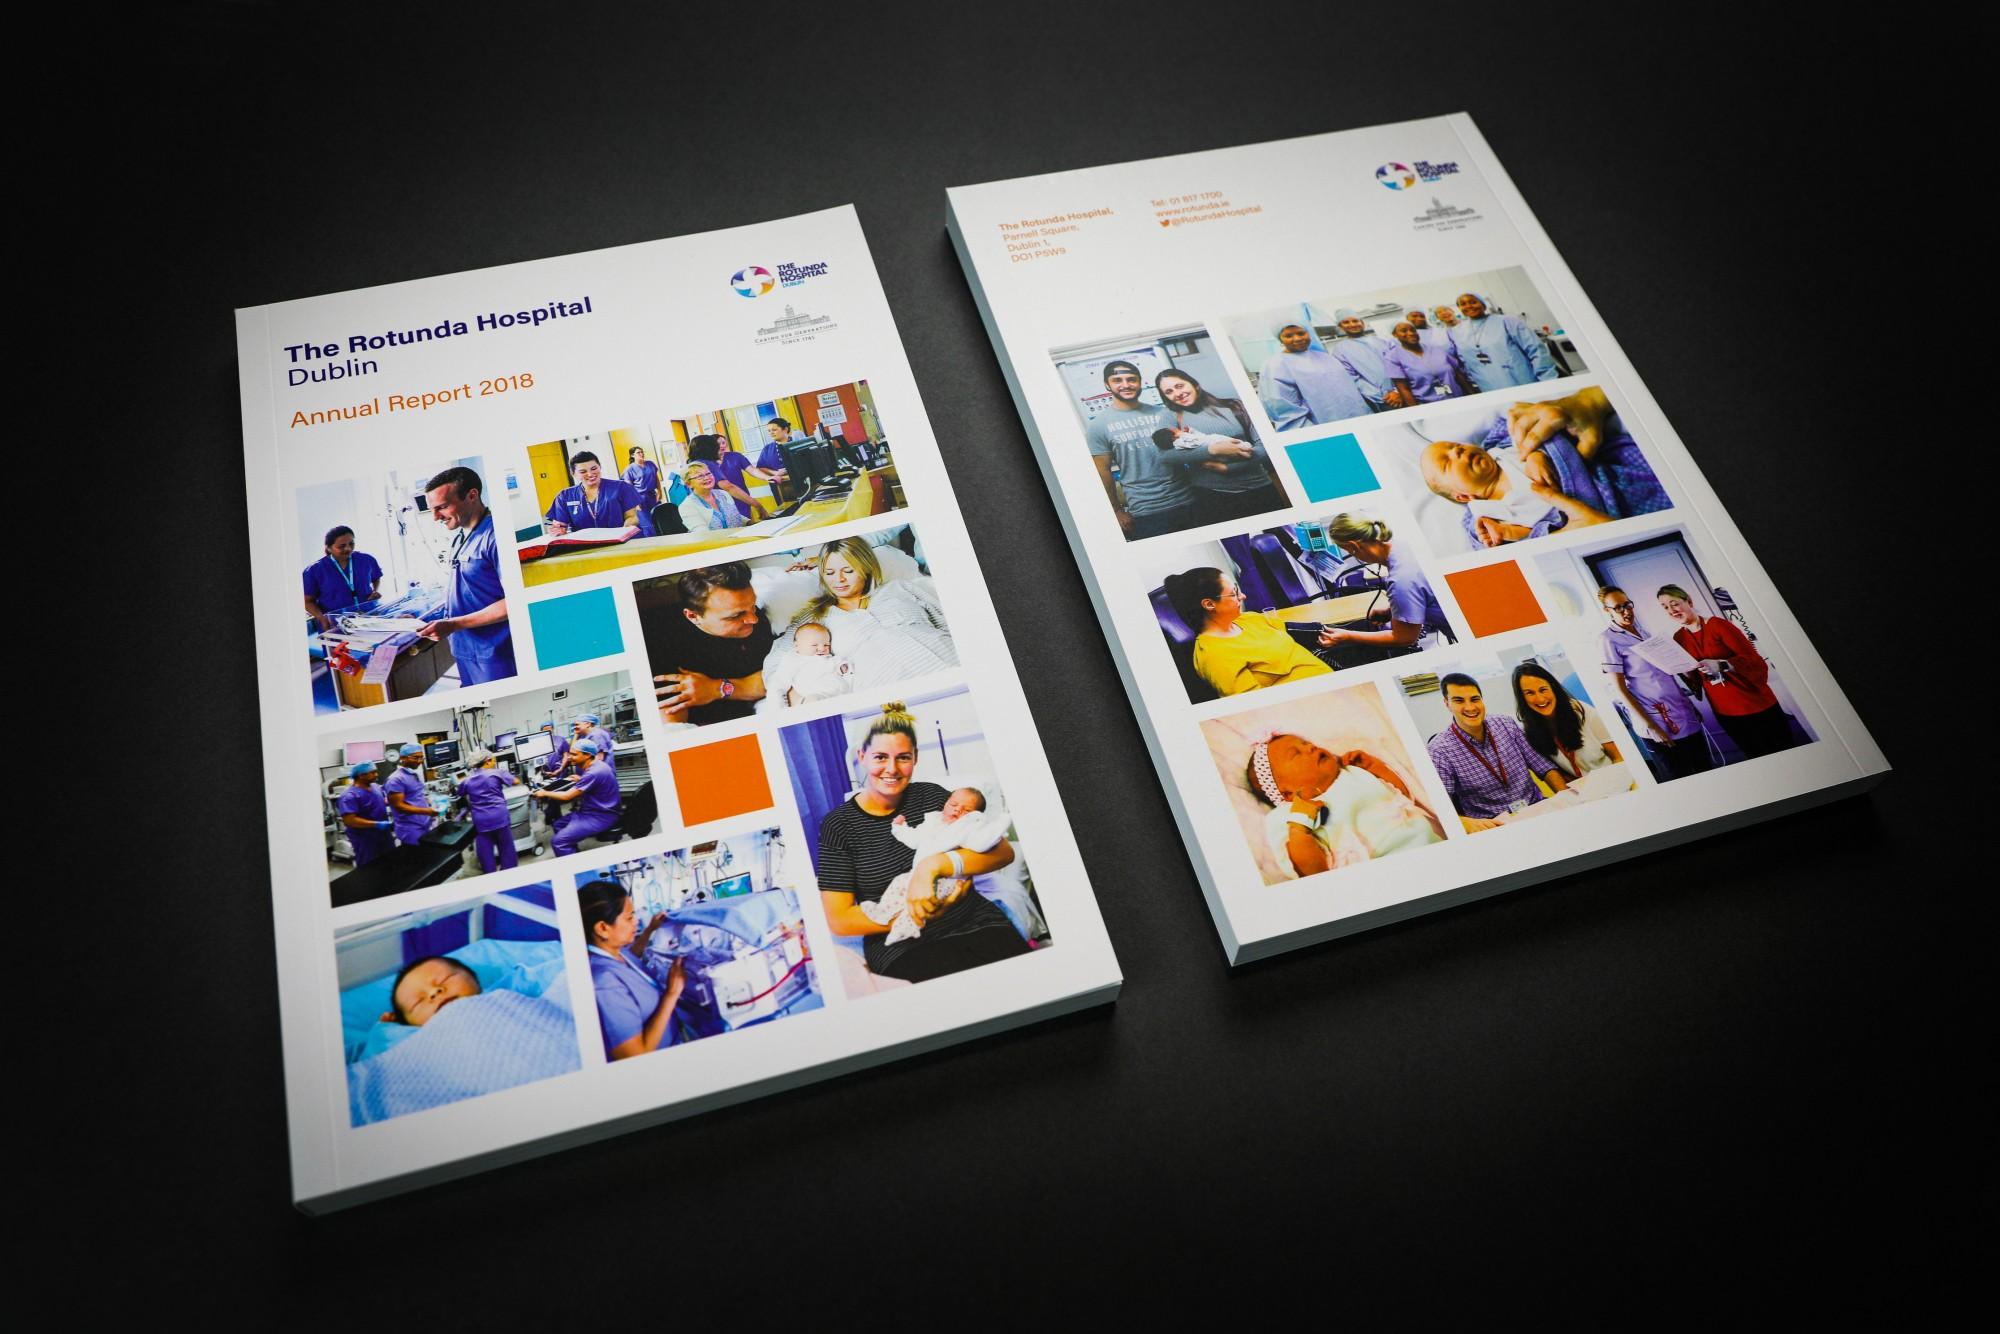 Cover image: The Rotunda Hospital Annual Report 2018